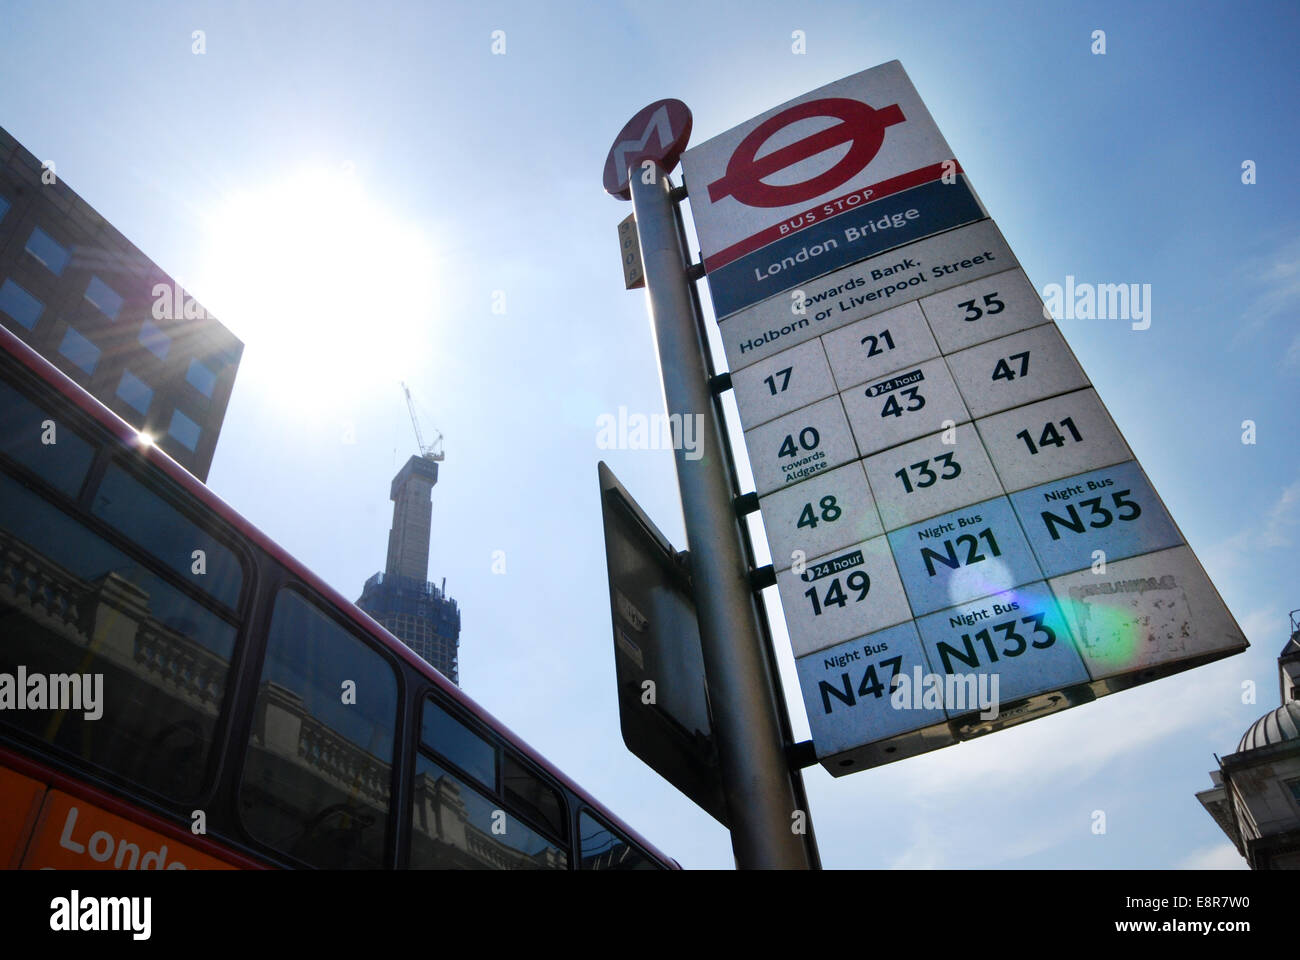 London Bridge bus stop, London UK Stock Photo